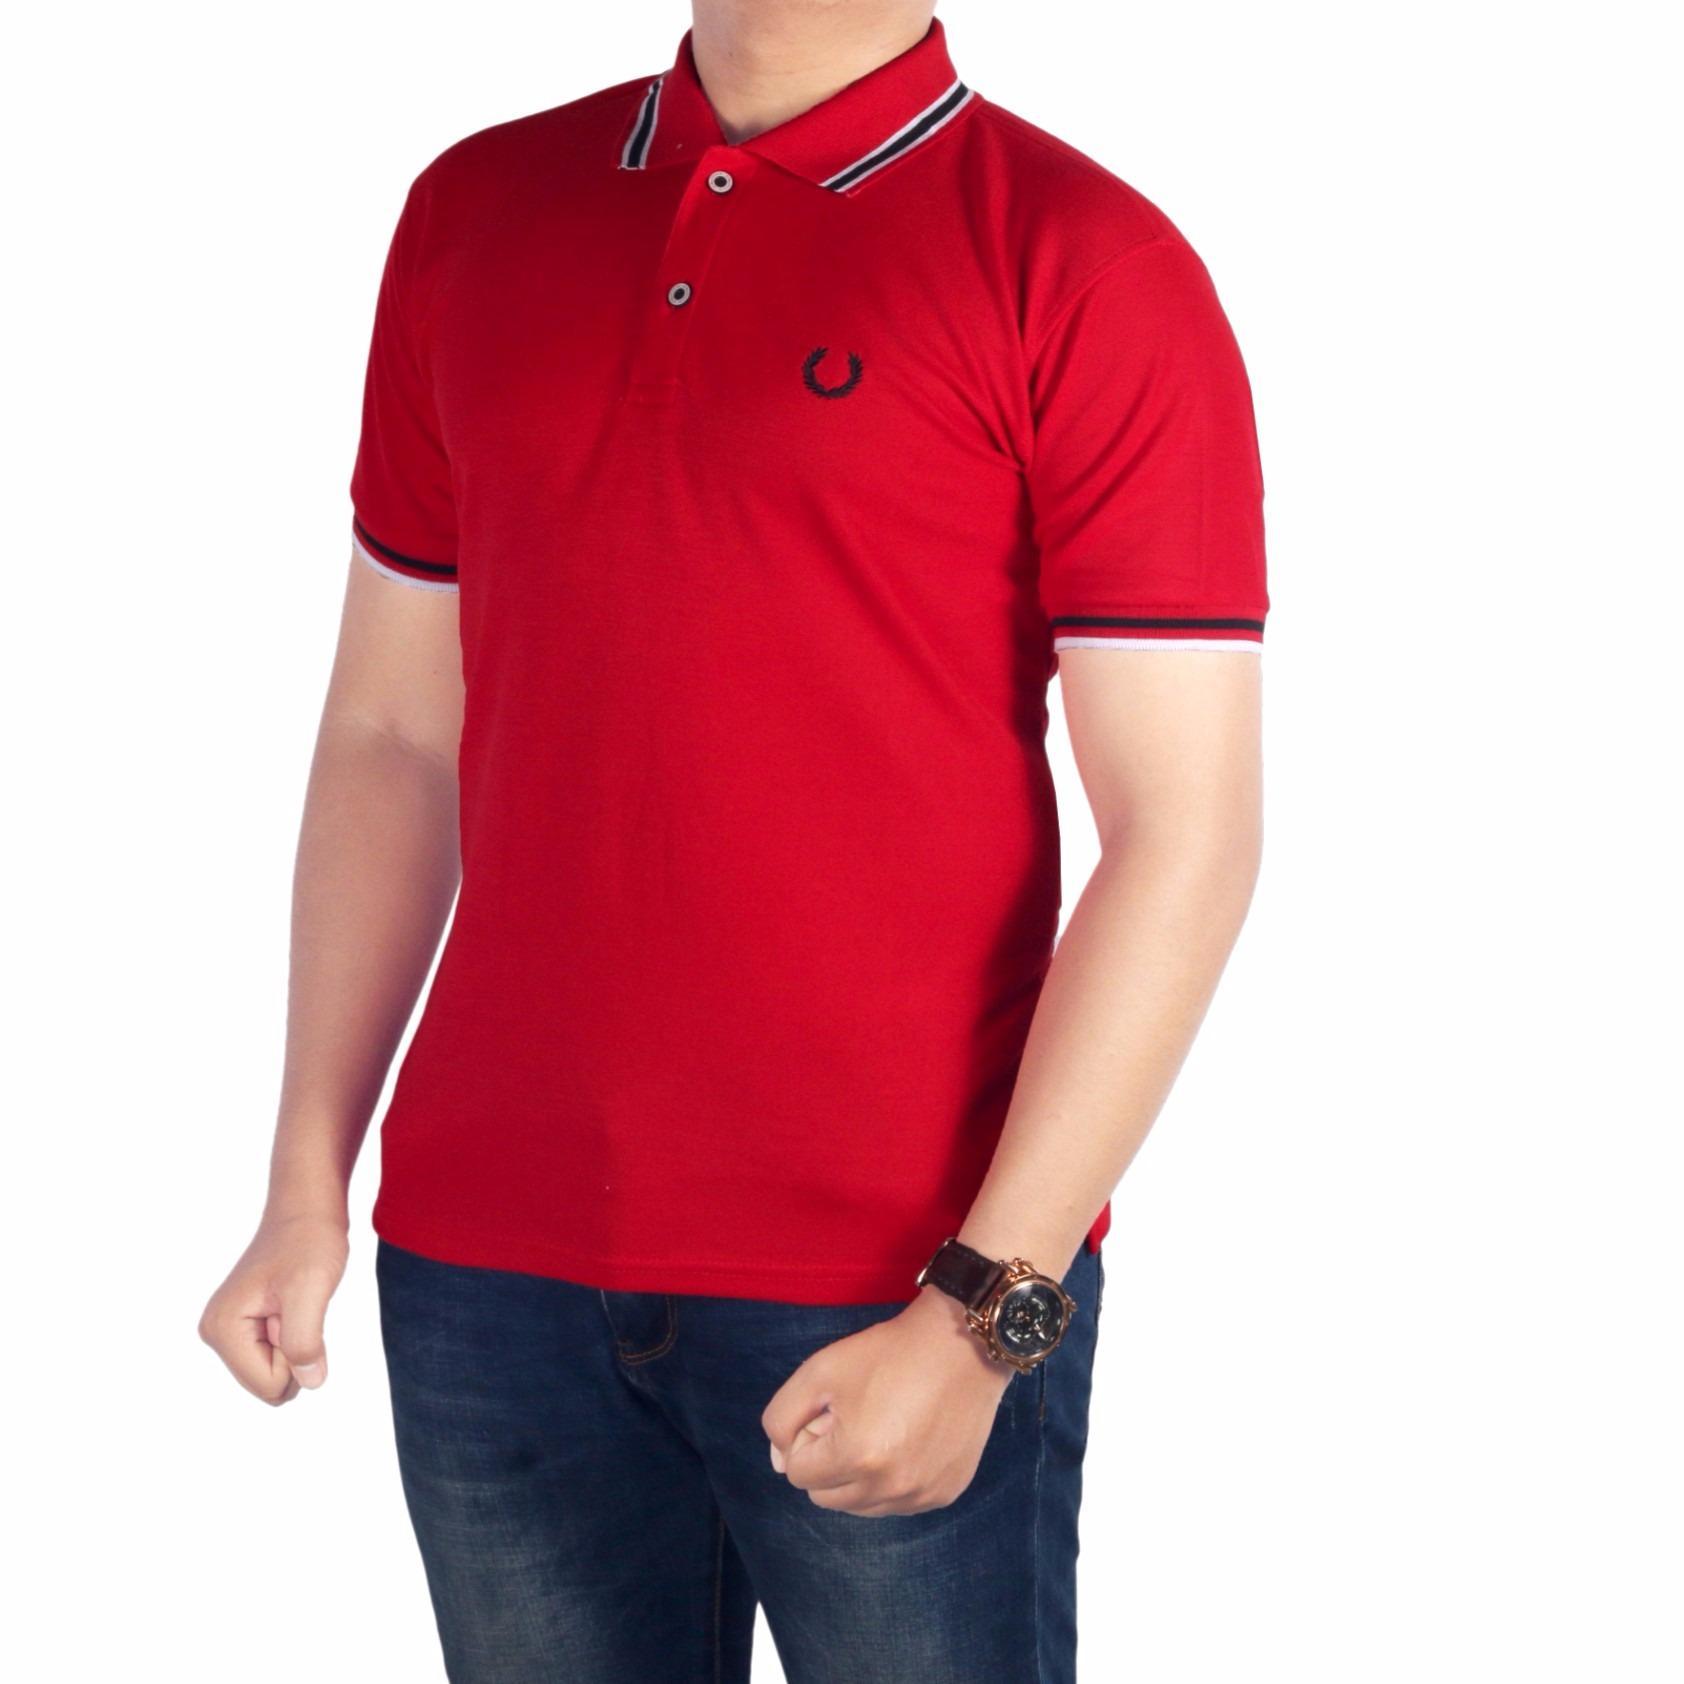 Dgm_Fashion1 Baju Kaos Kerah Polos Merah/ Kaos Polo Polos Hitam/Kaos Polo Kerah Sanghai/Kaos PoloShirt Pria/Kaos Polo Kerah Sanghai/Polo Kerah/Polo men/Kaos Polo/Polo Kaos/Kaos Polo Six IP 4548